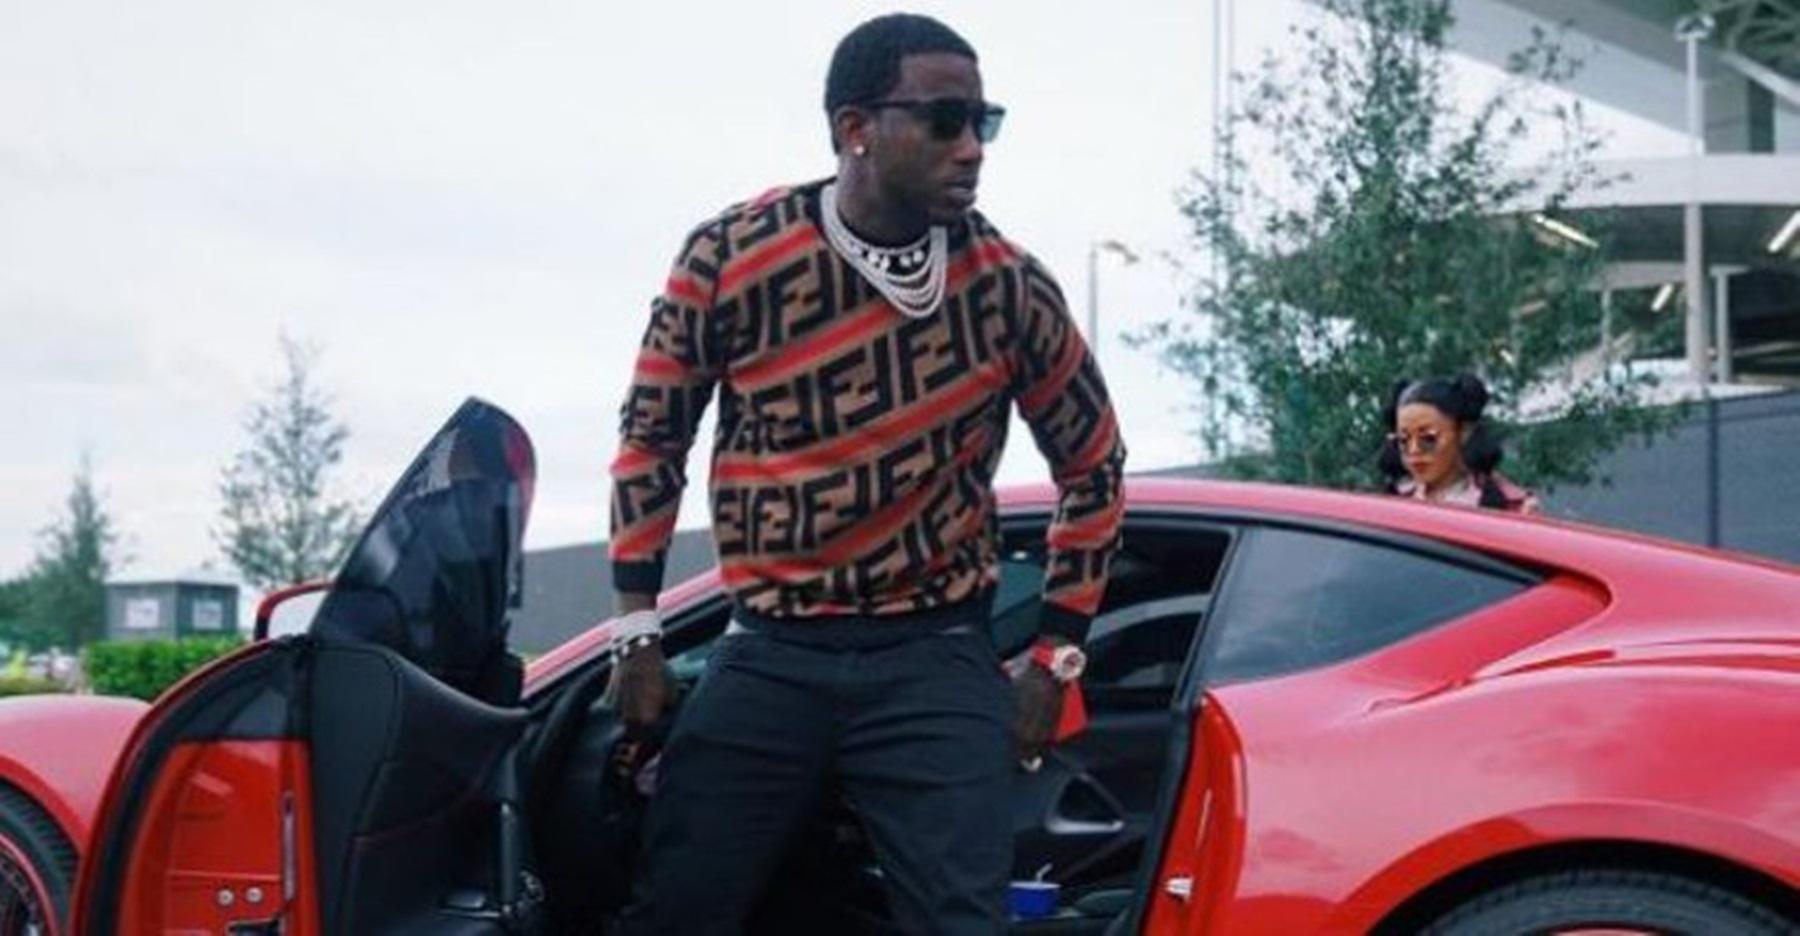 Gucci Mane Keyshia Ka'Oir Ferrari Towed